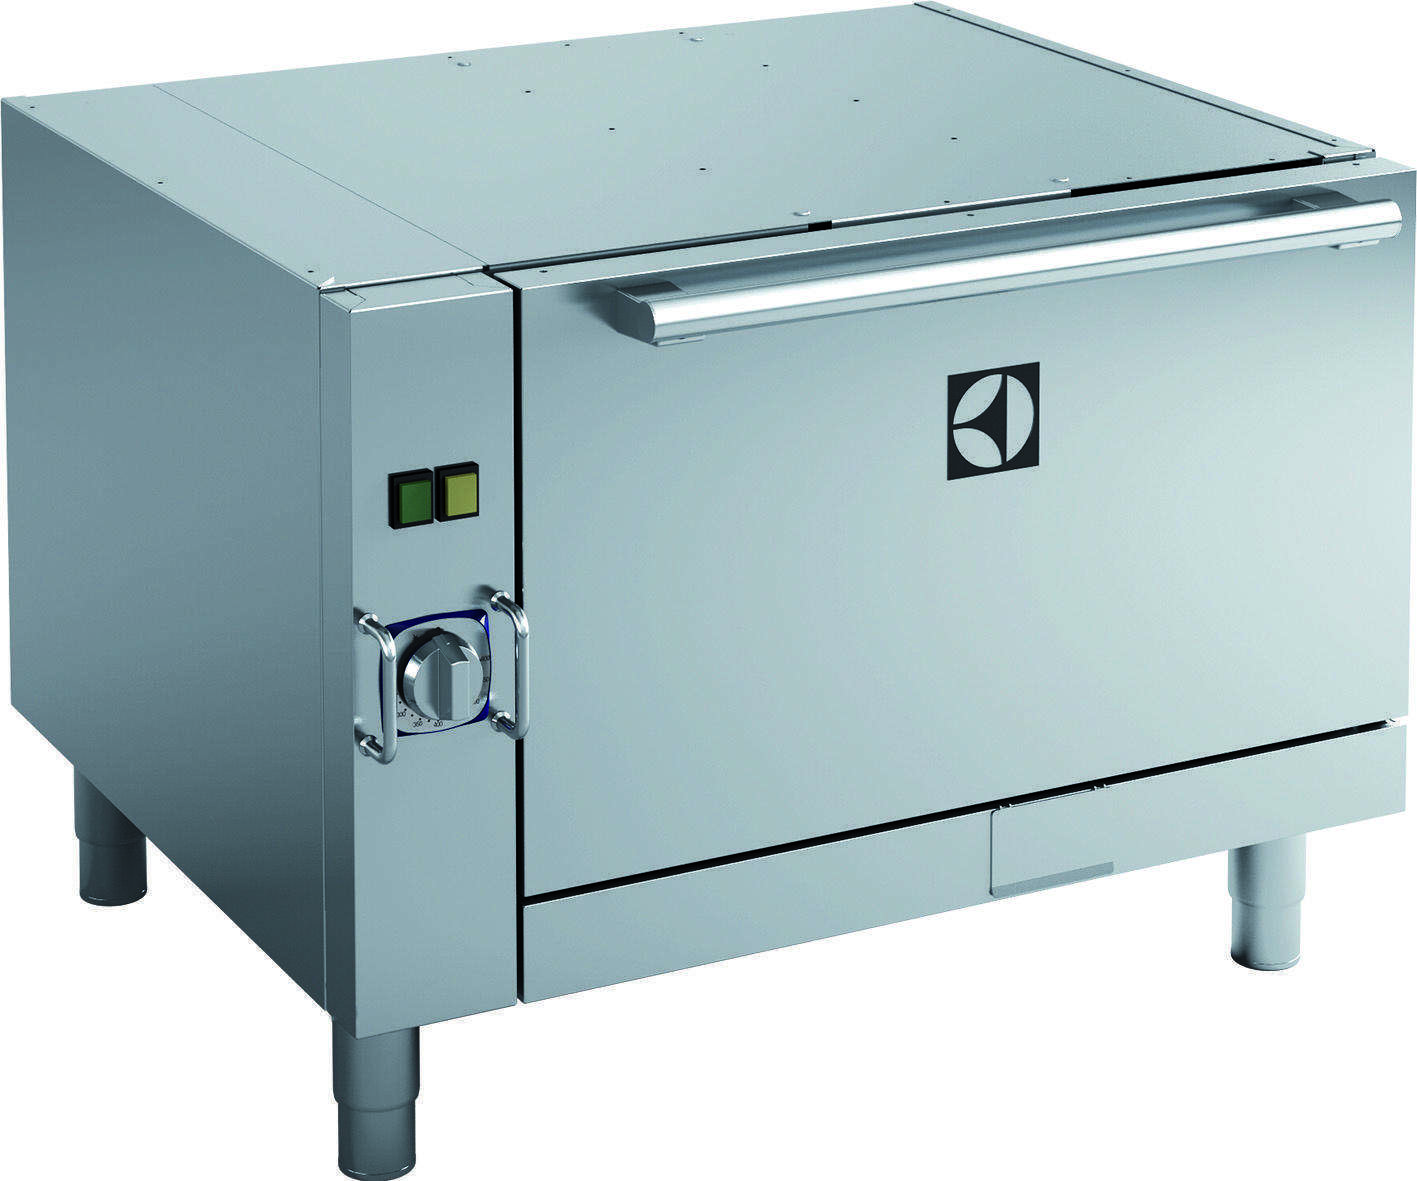 Electrolux Professional 169110 (AFFG36) | CKitchen.com